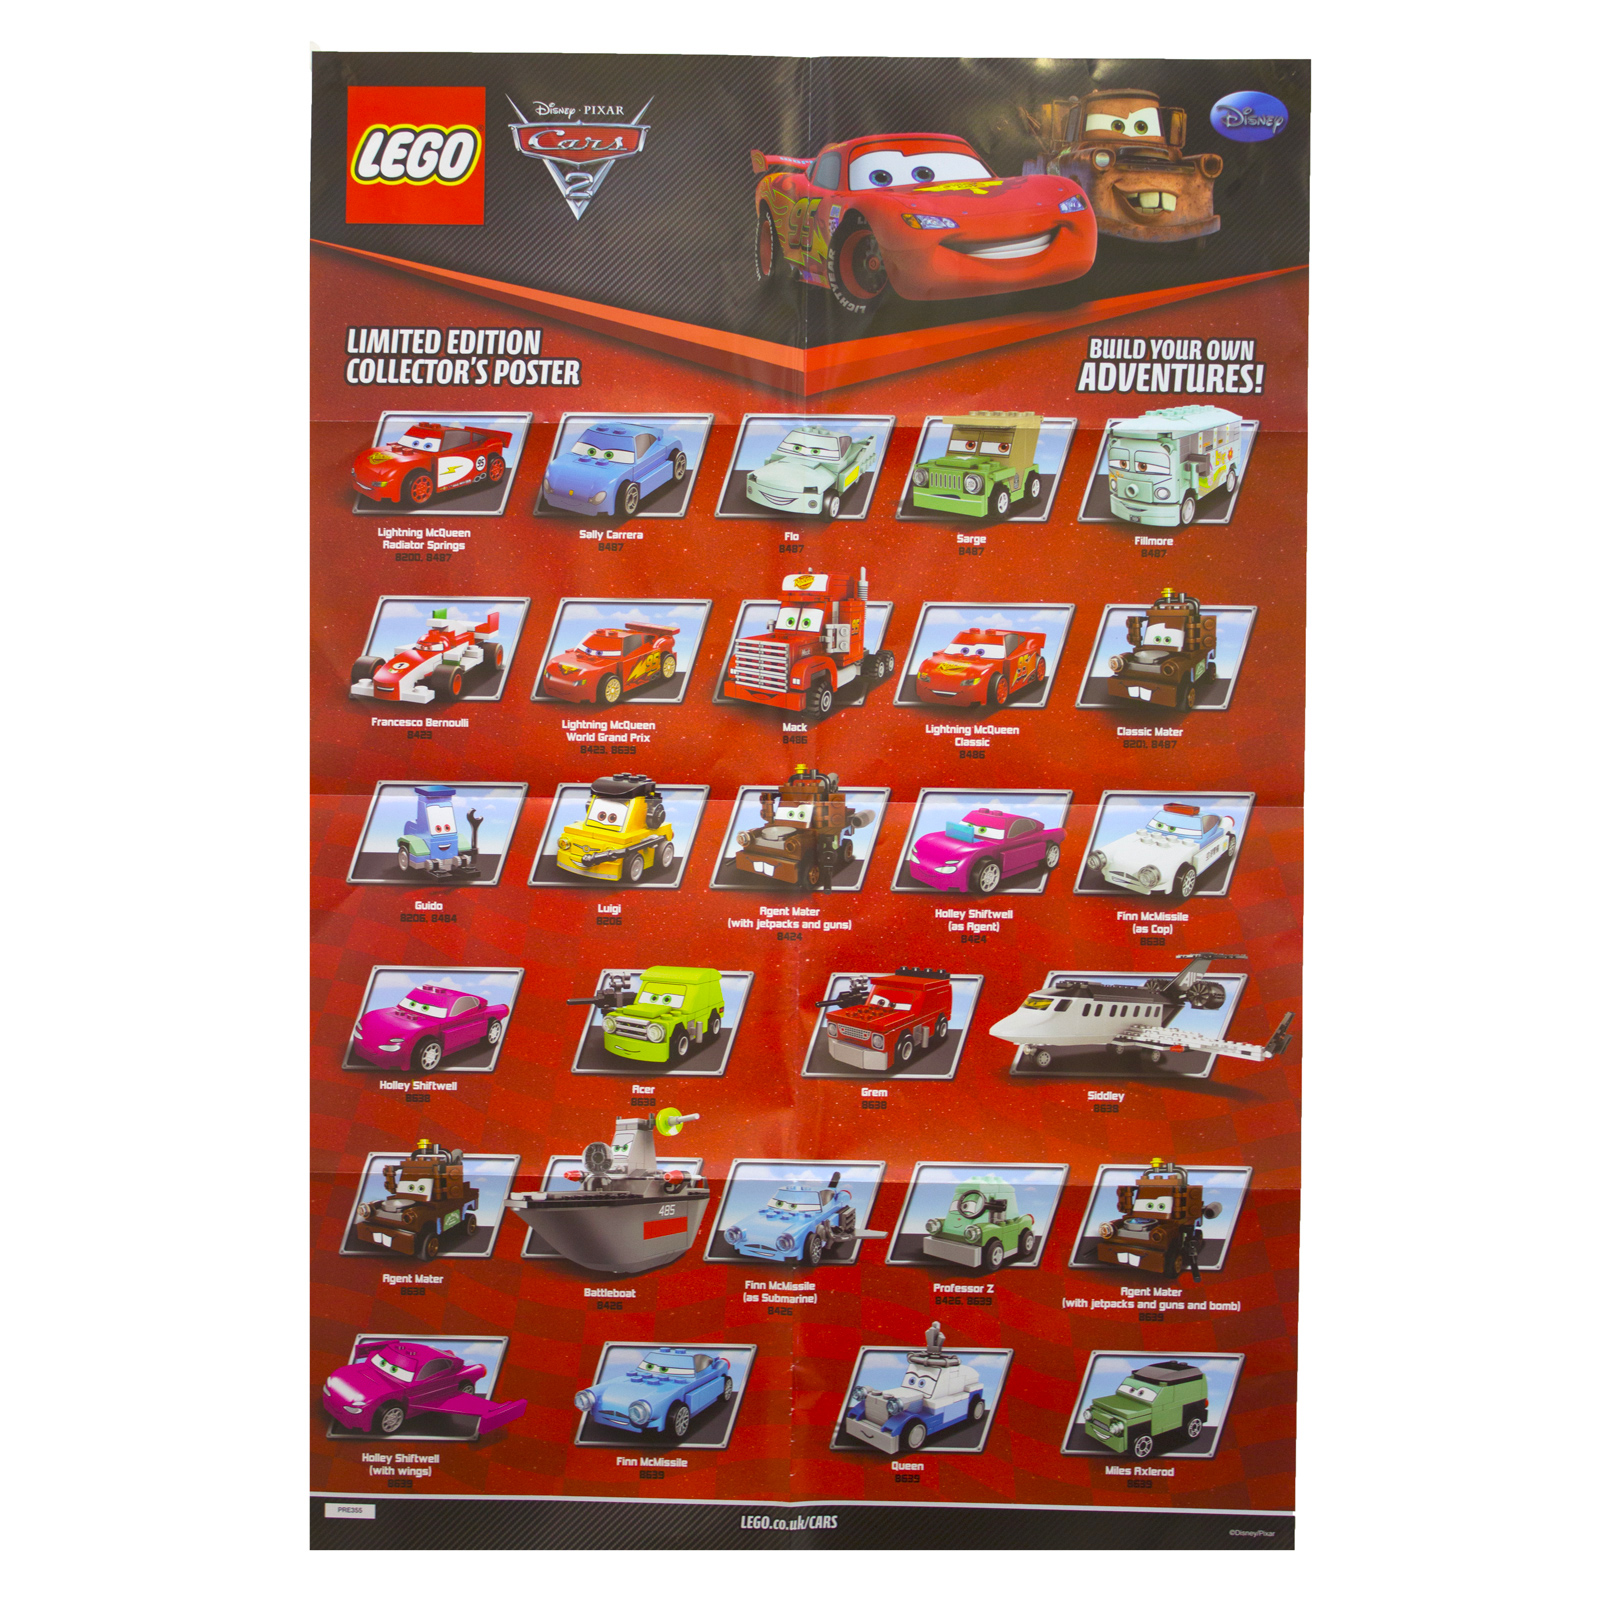 Disney cars 2 movie poster decor pixar print art wall lego figures kids pre355 ebay